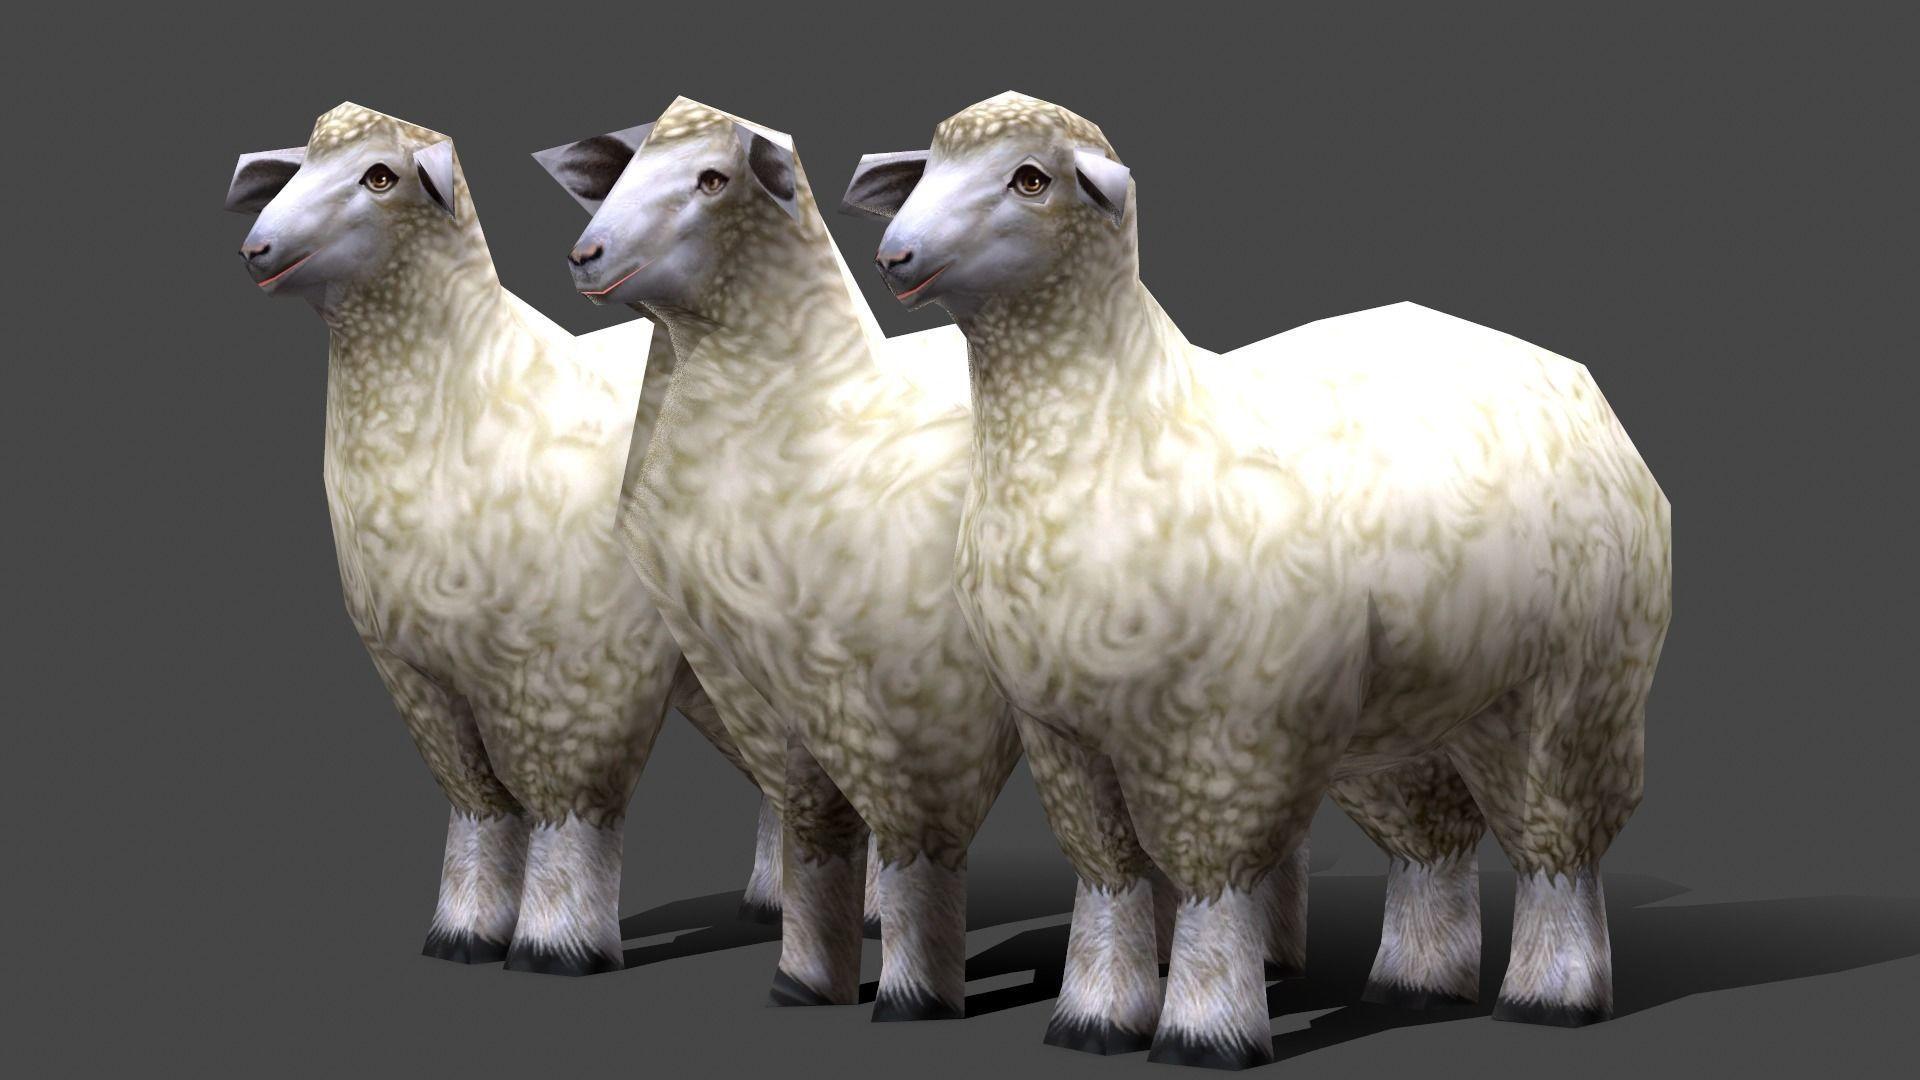 Sheep - - Low poly Animal